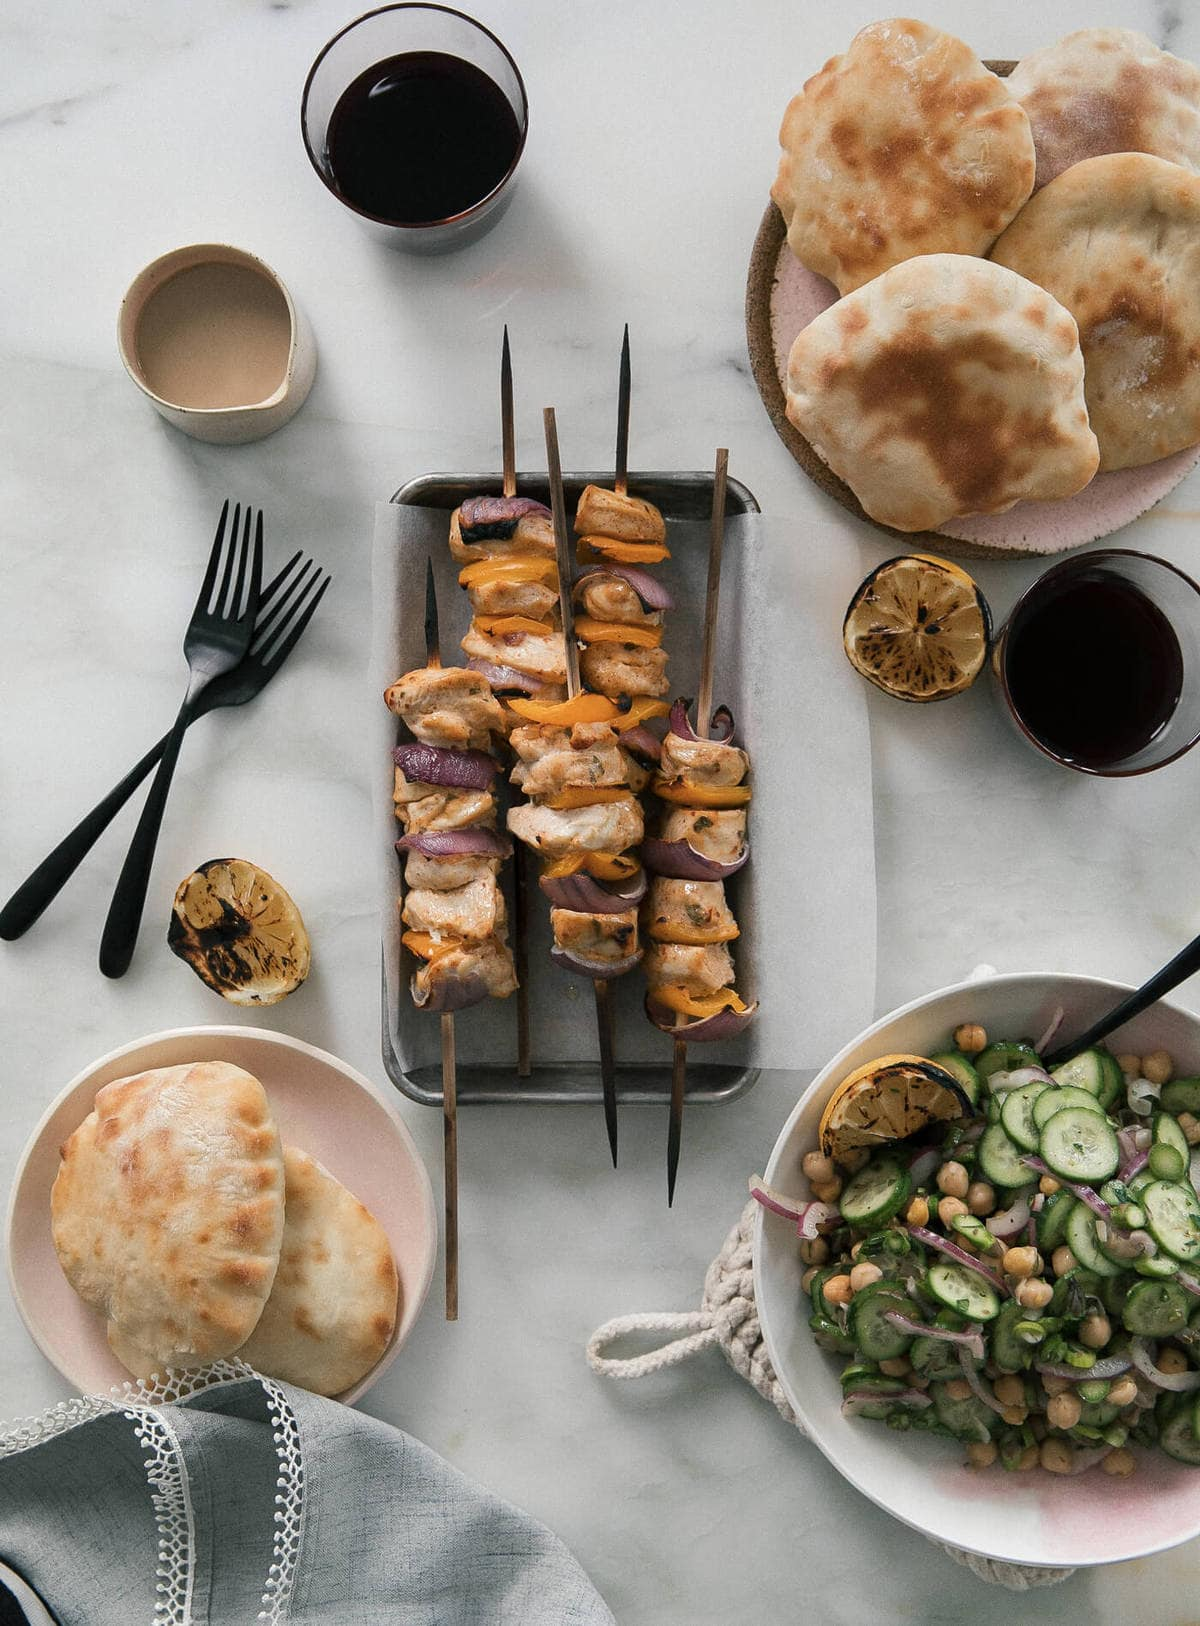 Yogurt-Marinated Ras al Hanout Chicken Skewers